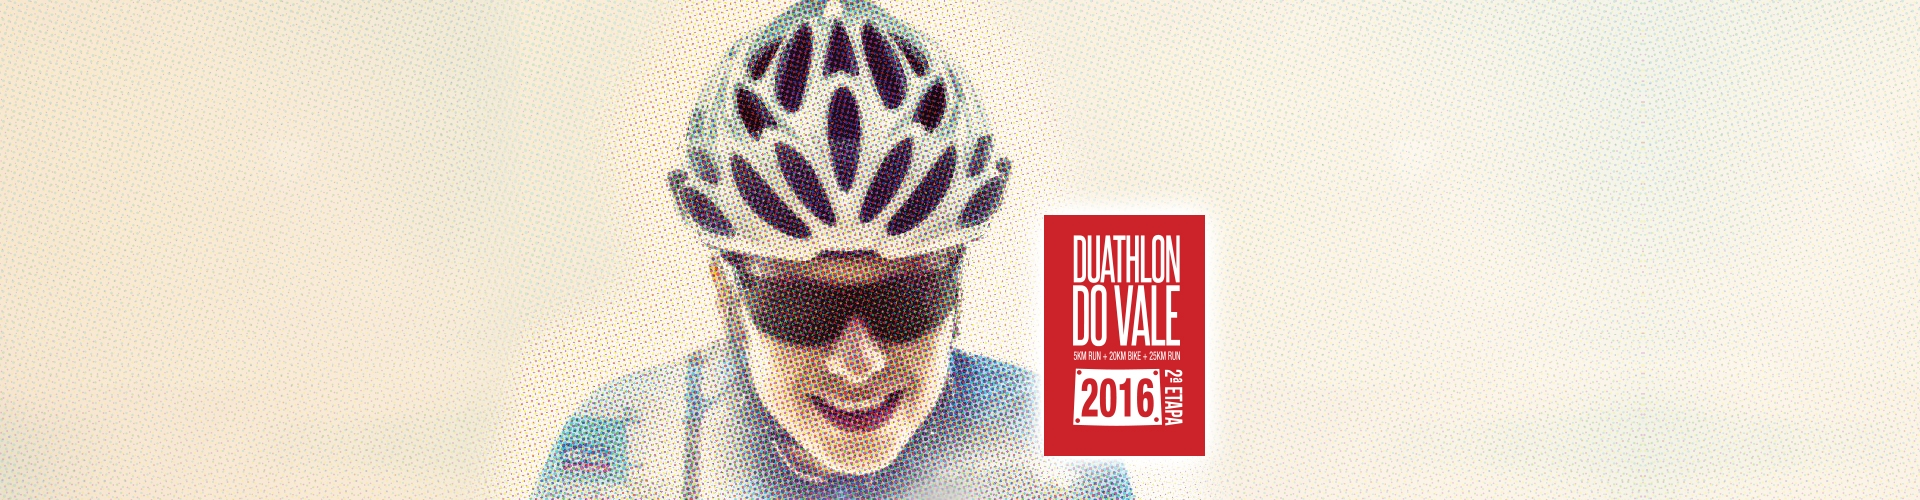 Duathlon do Vale 2016 (Etapa 2)